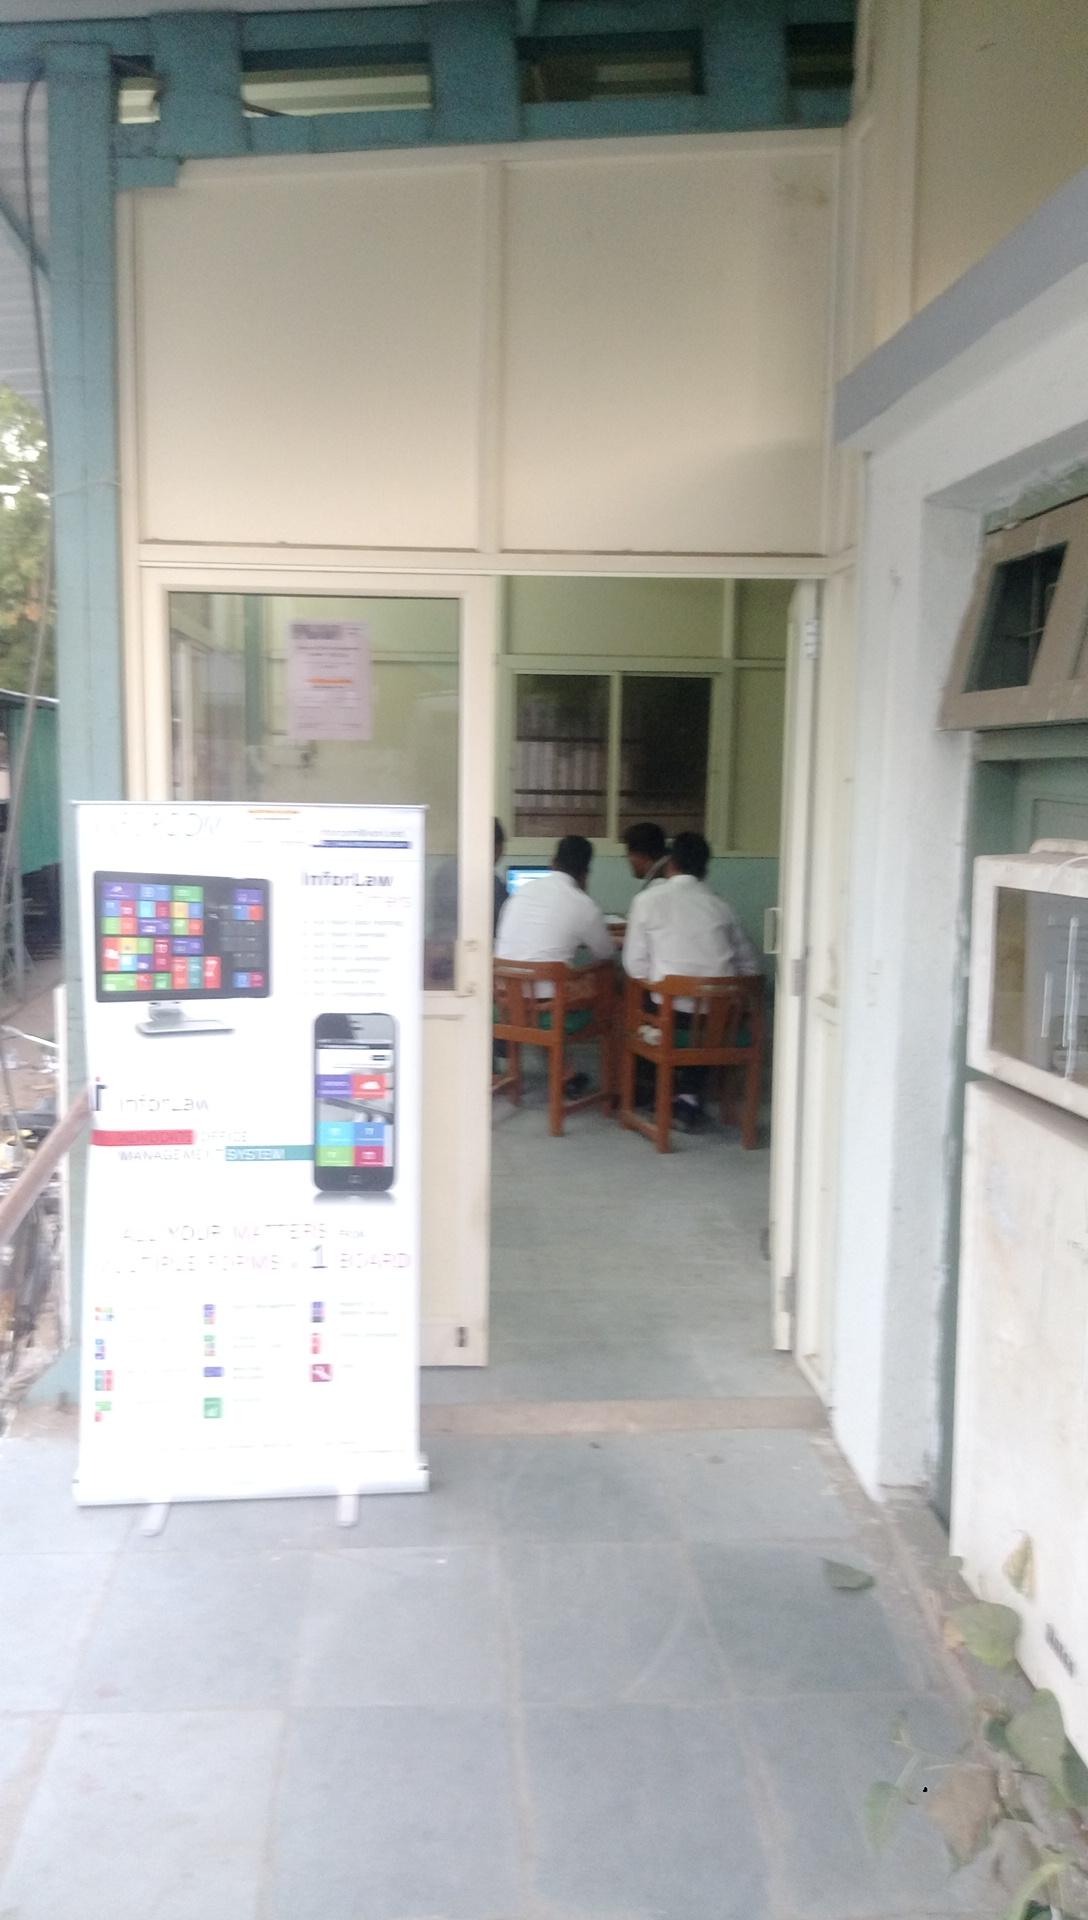 Inforcom Tech at City Civil Court for Software Demo